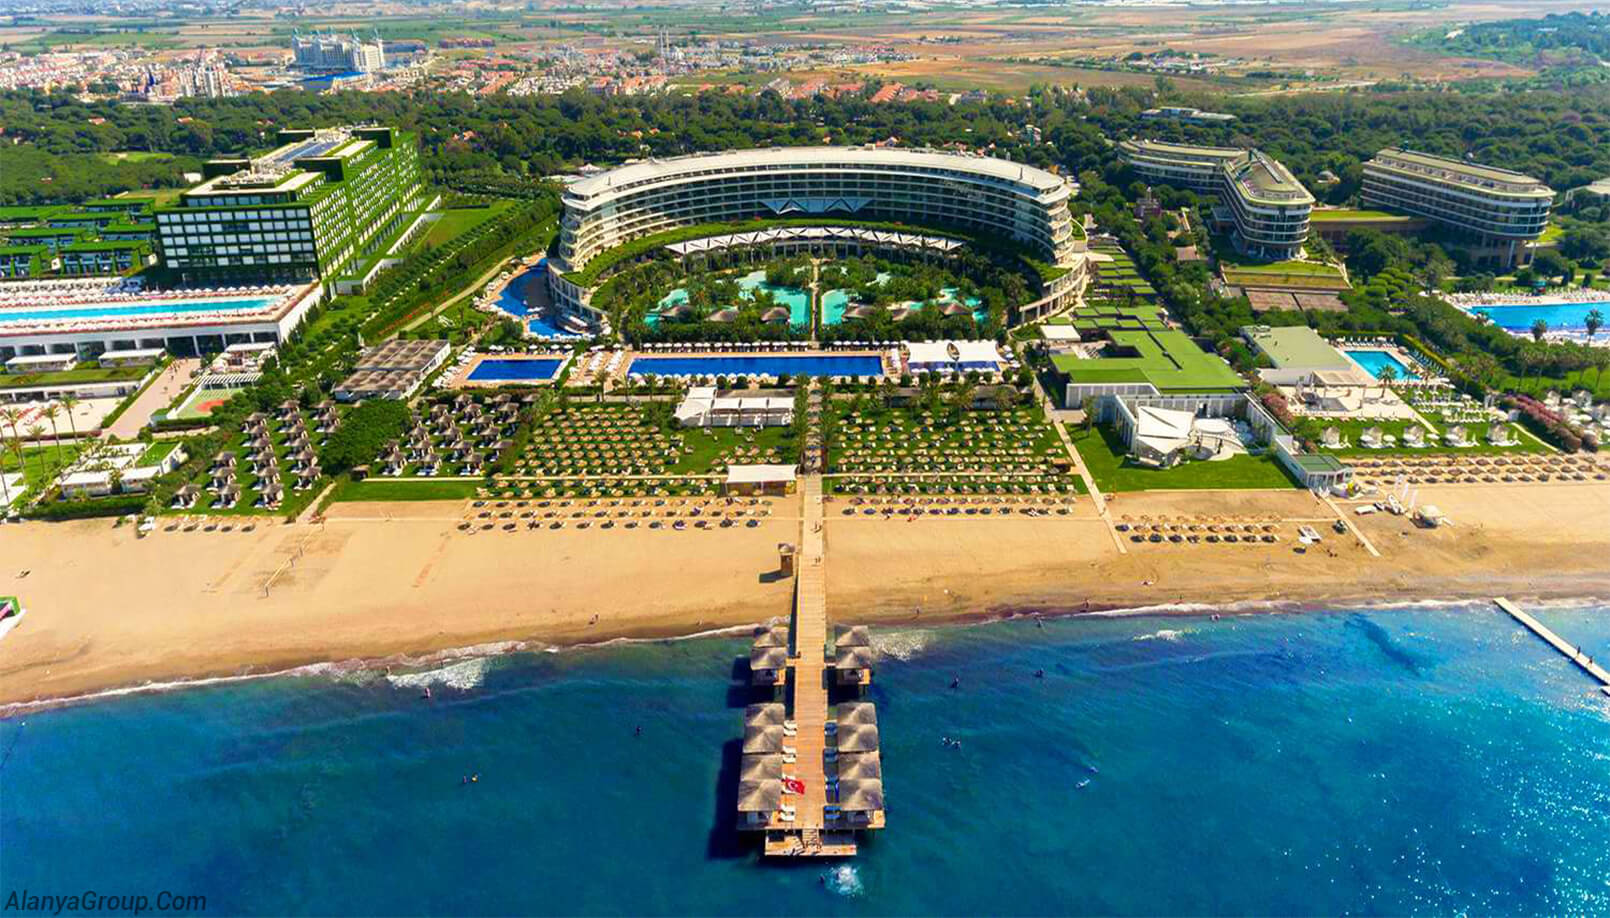 Antalya hotel beach